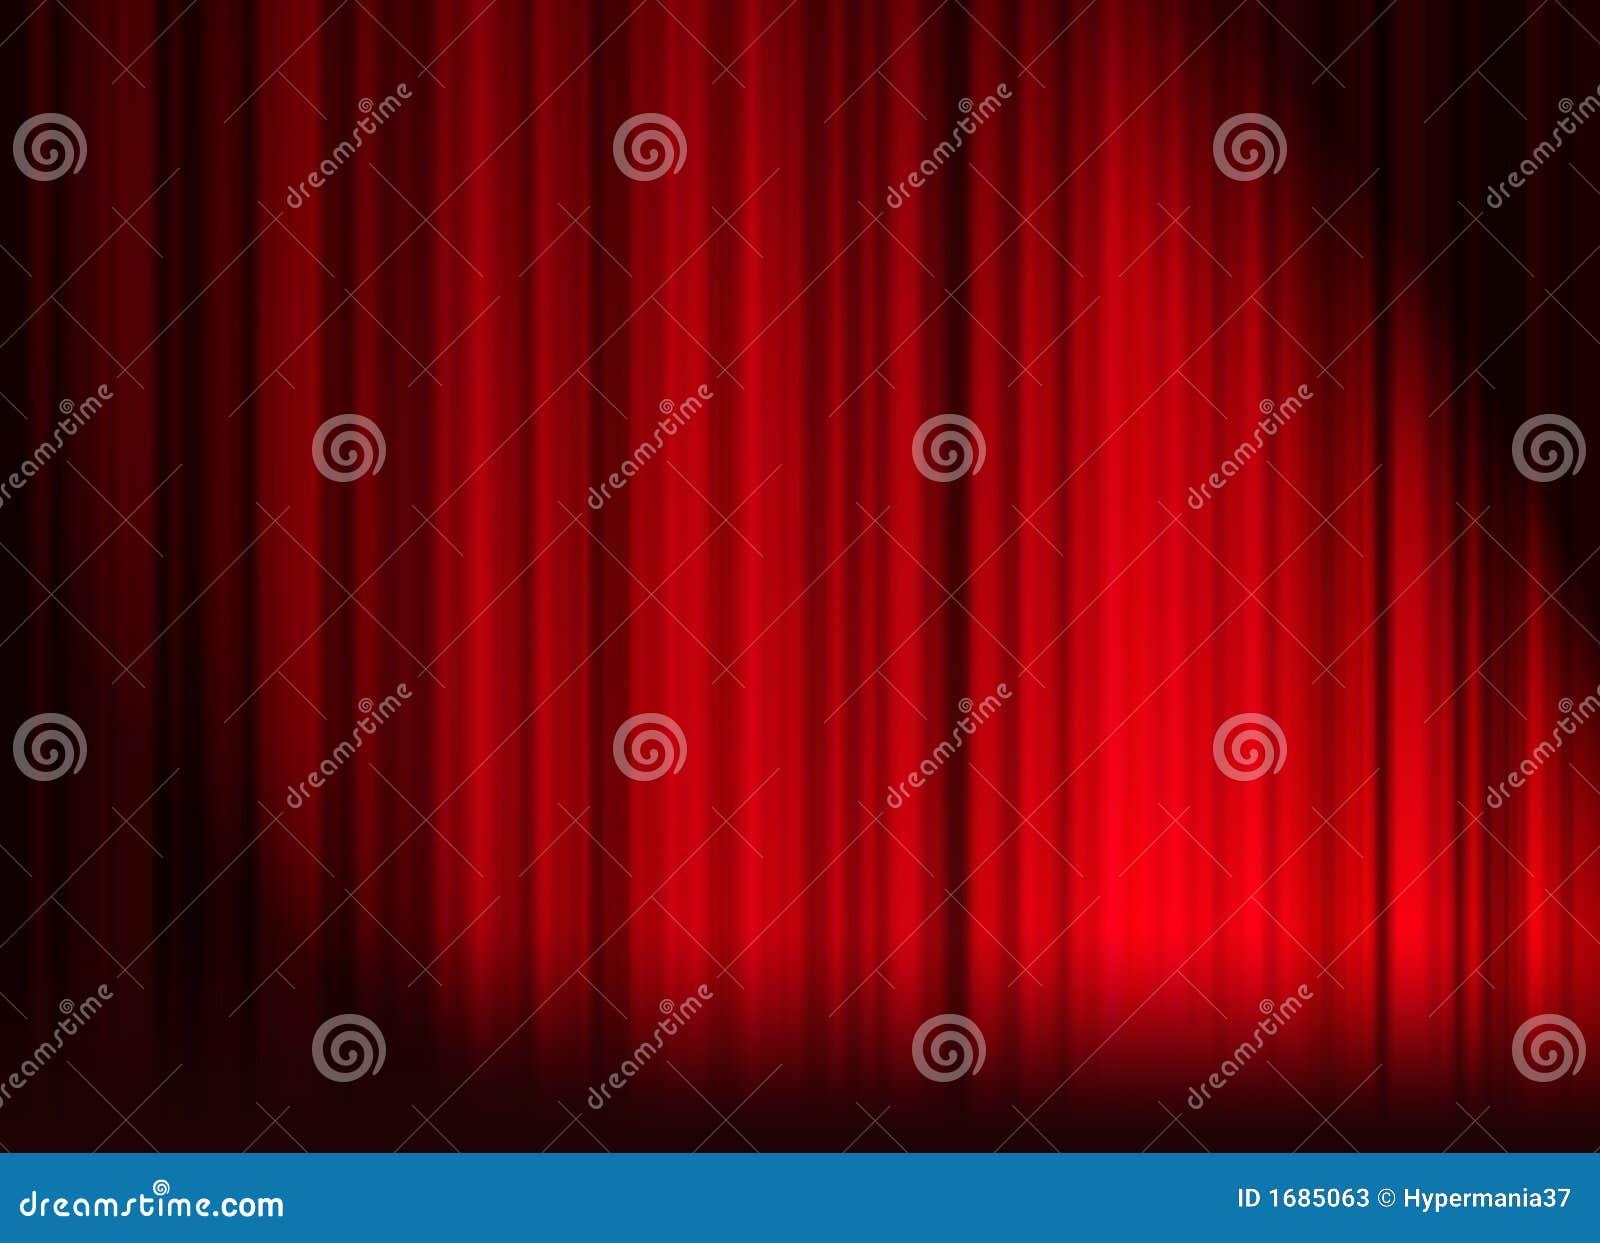 Cortina do teatro